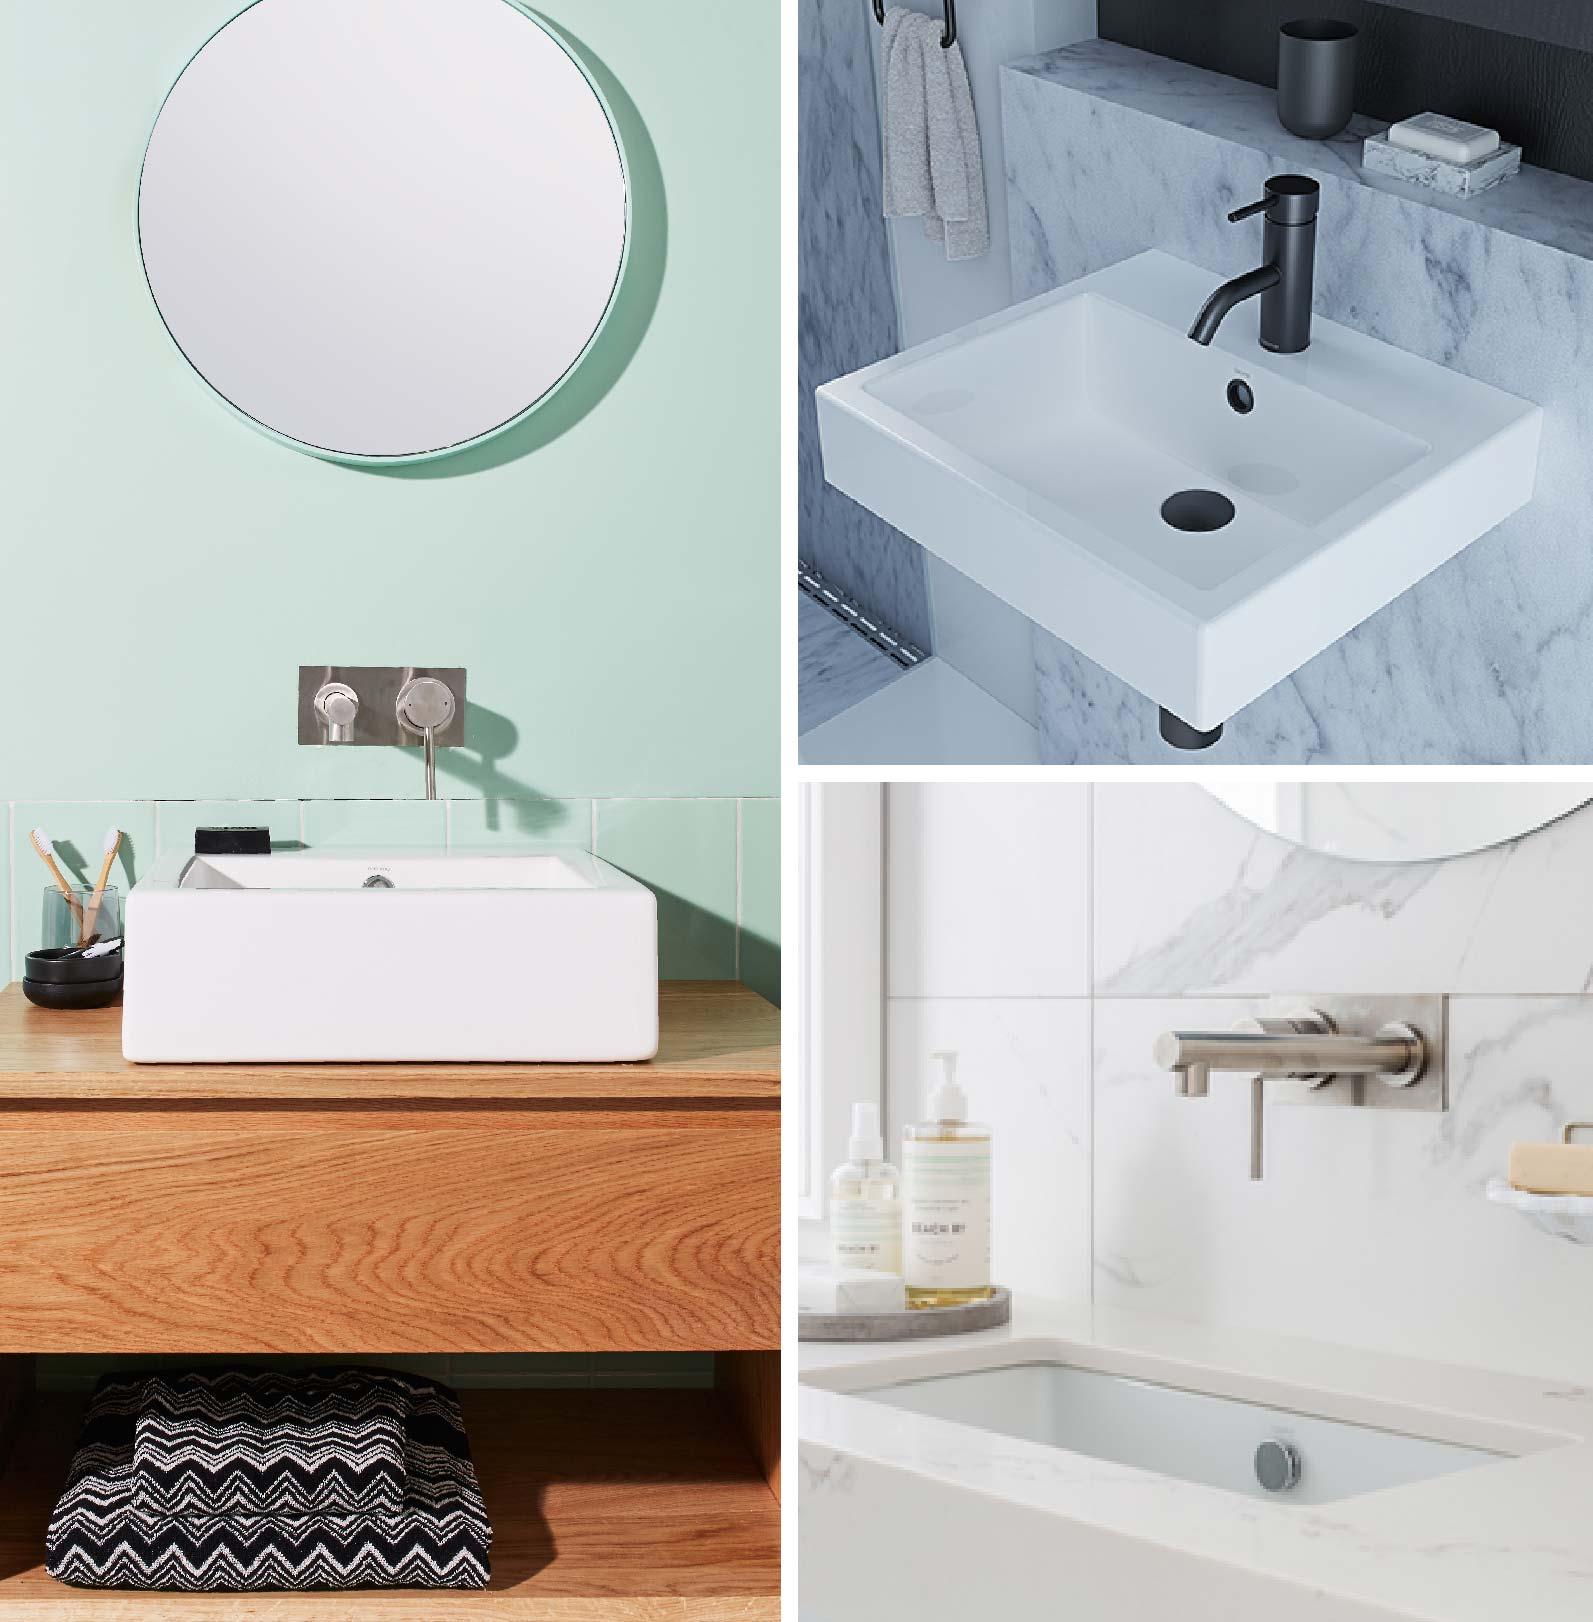 The basics of choosing a basin for your bathroom